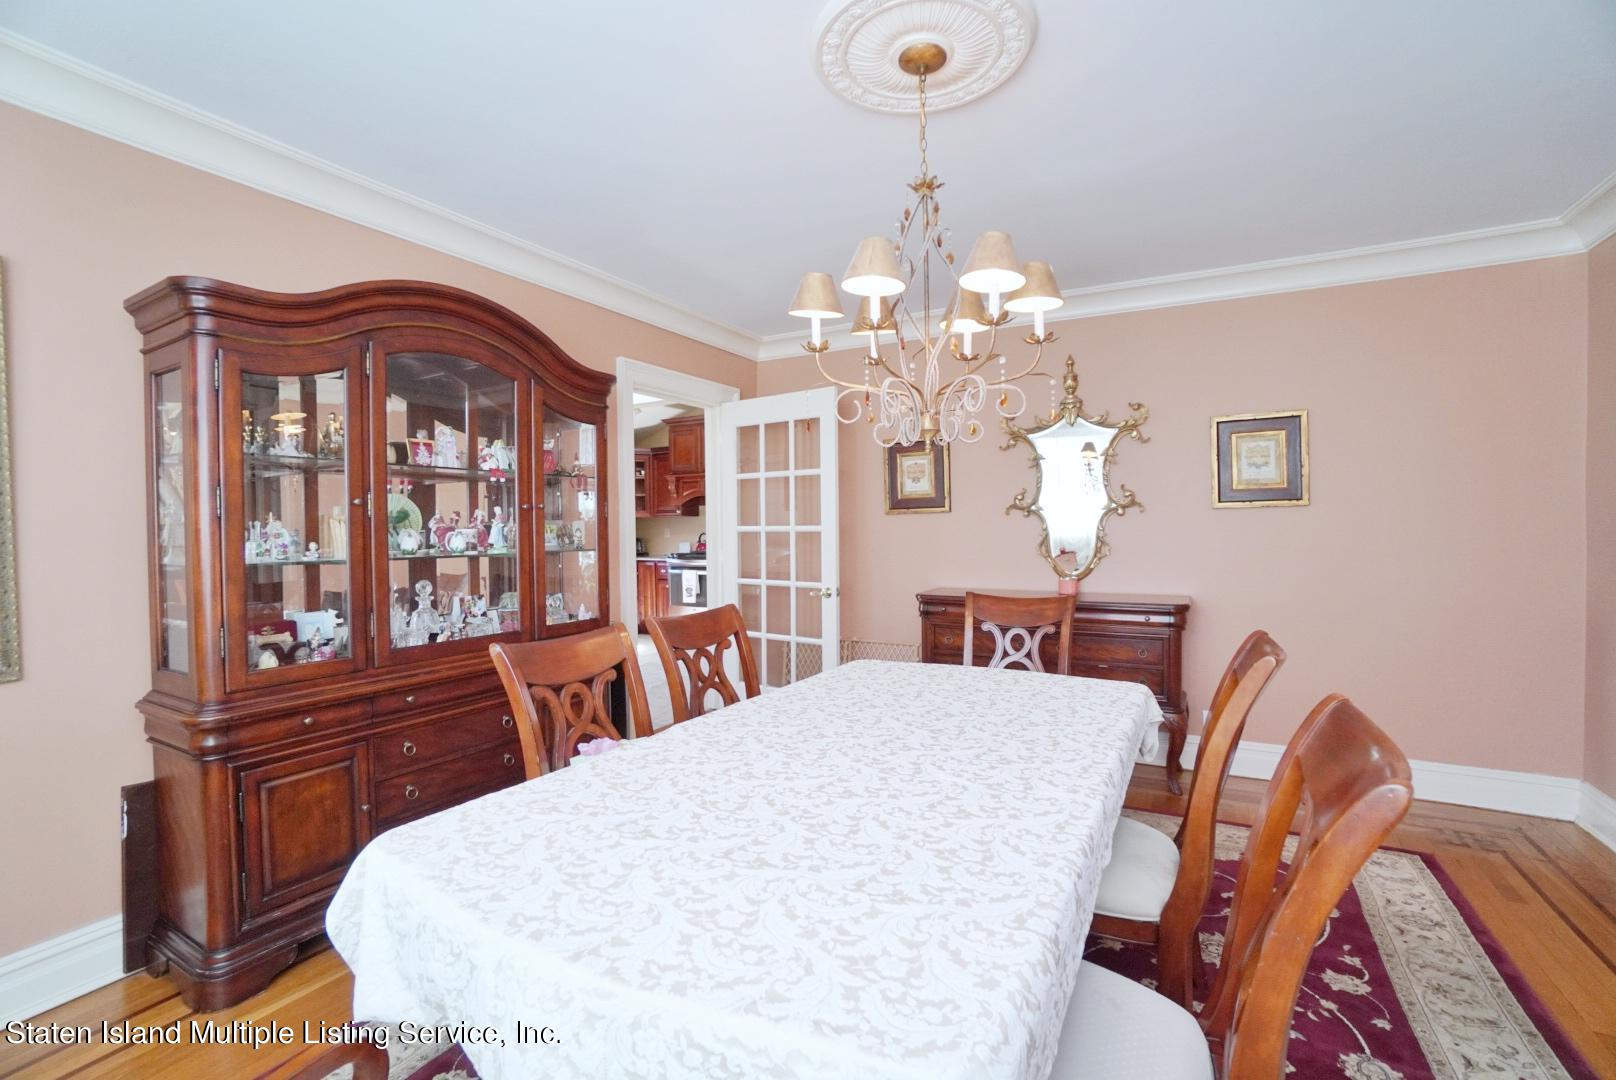 Single Family - Detached 264 Fisher Avenue  Staten Island, NY 10307, MLS-1146898-18